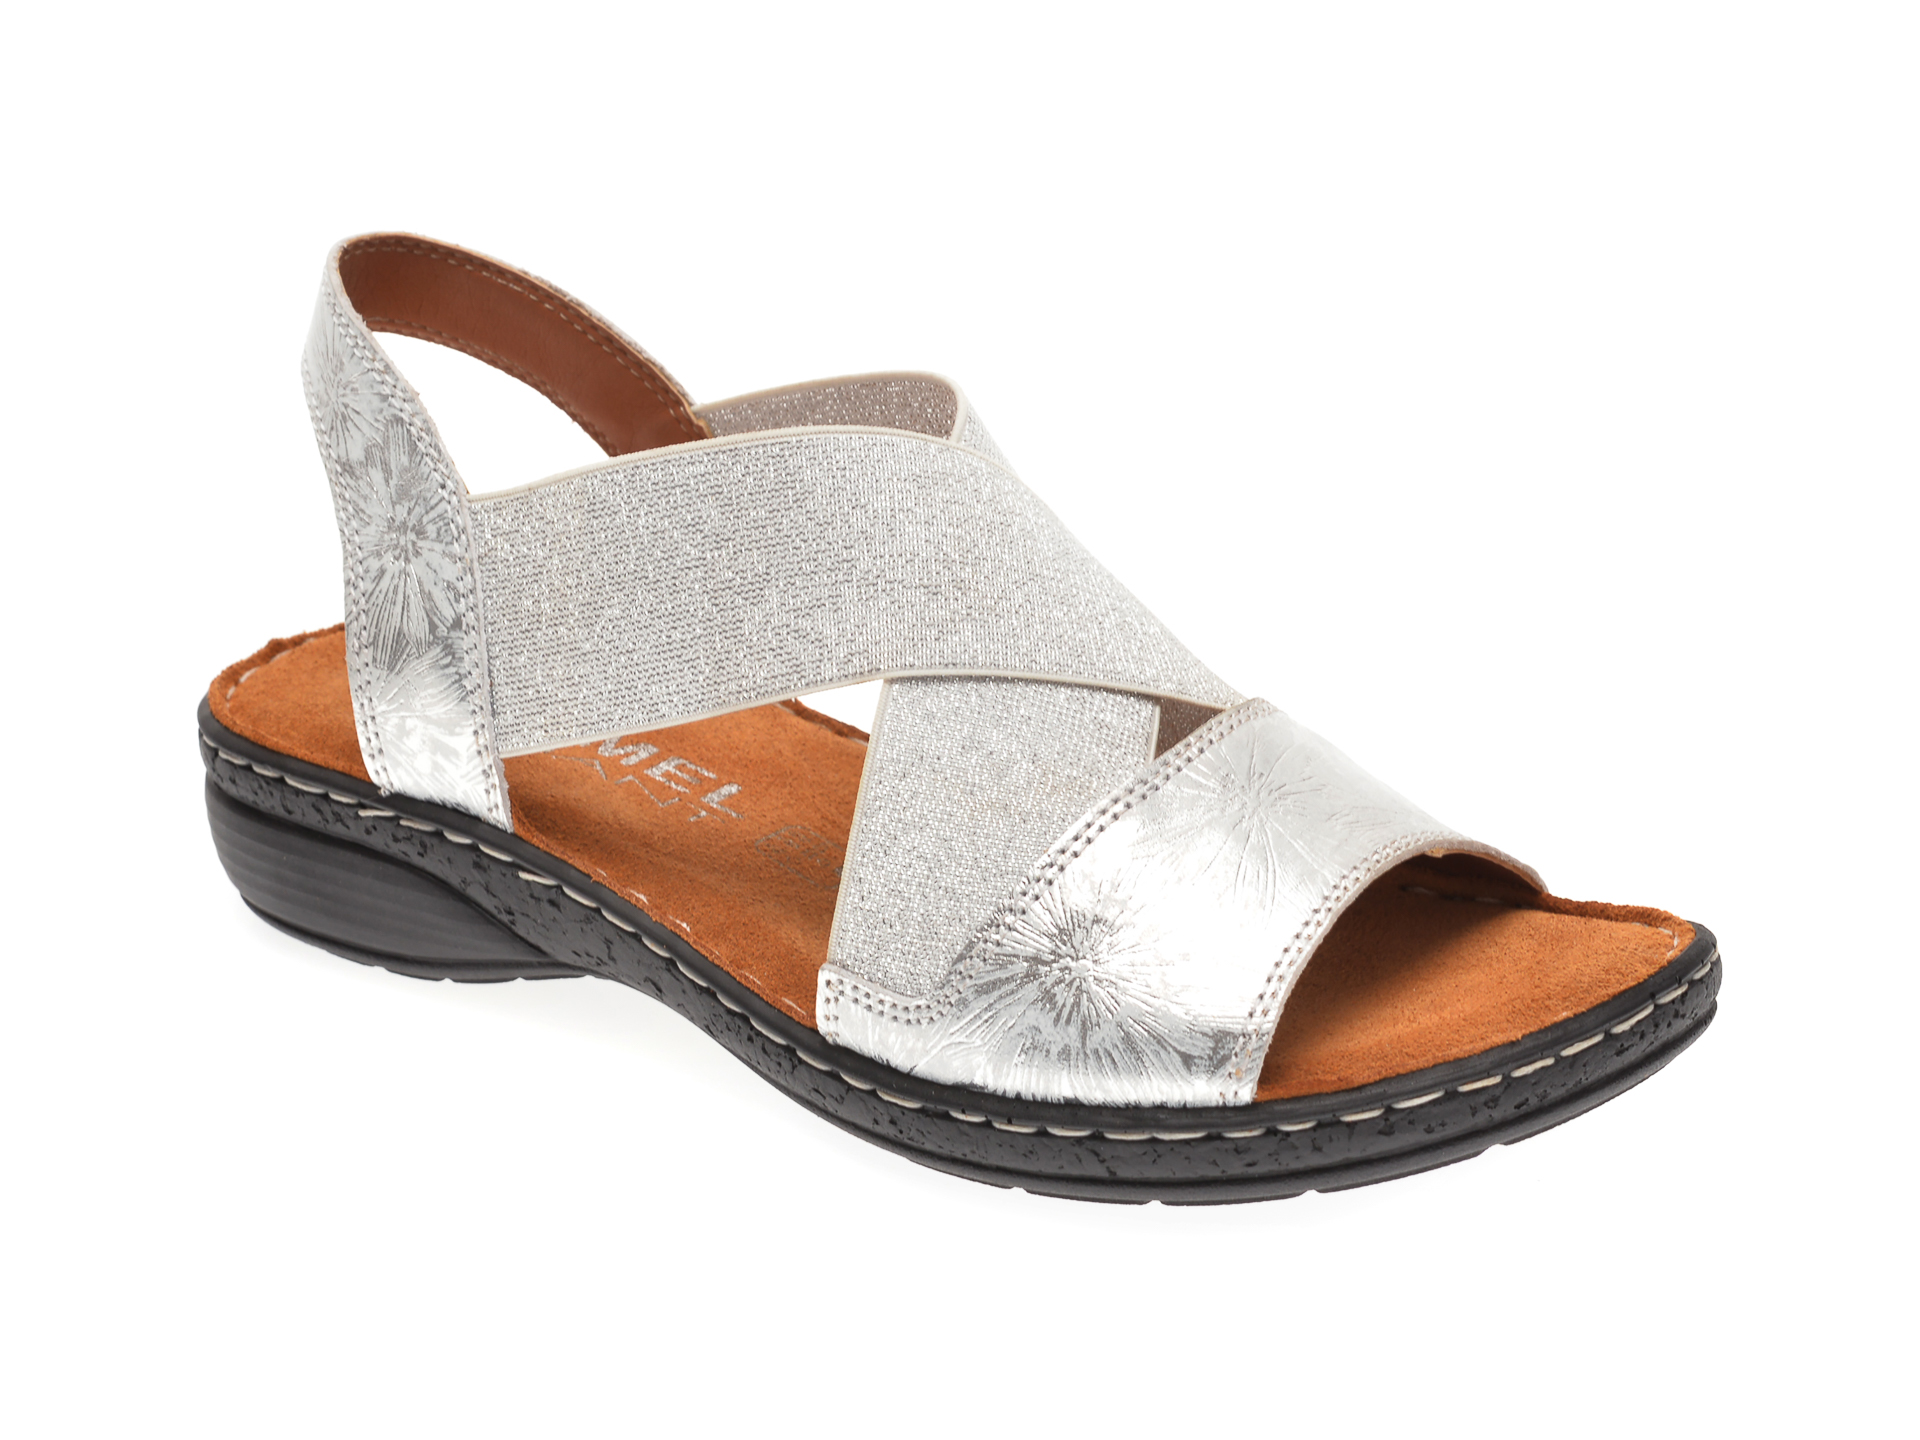 Sandale LUMEL argintii, 263, din piele naturala